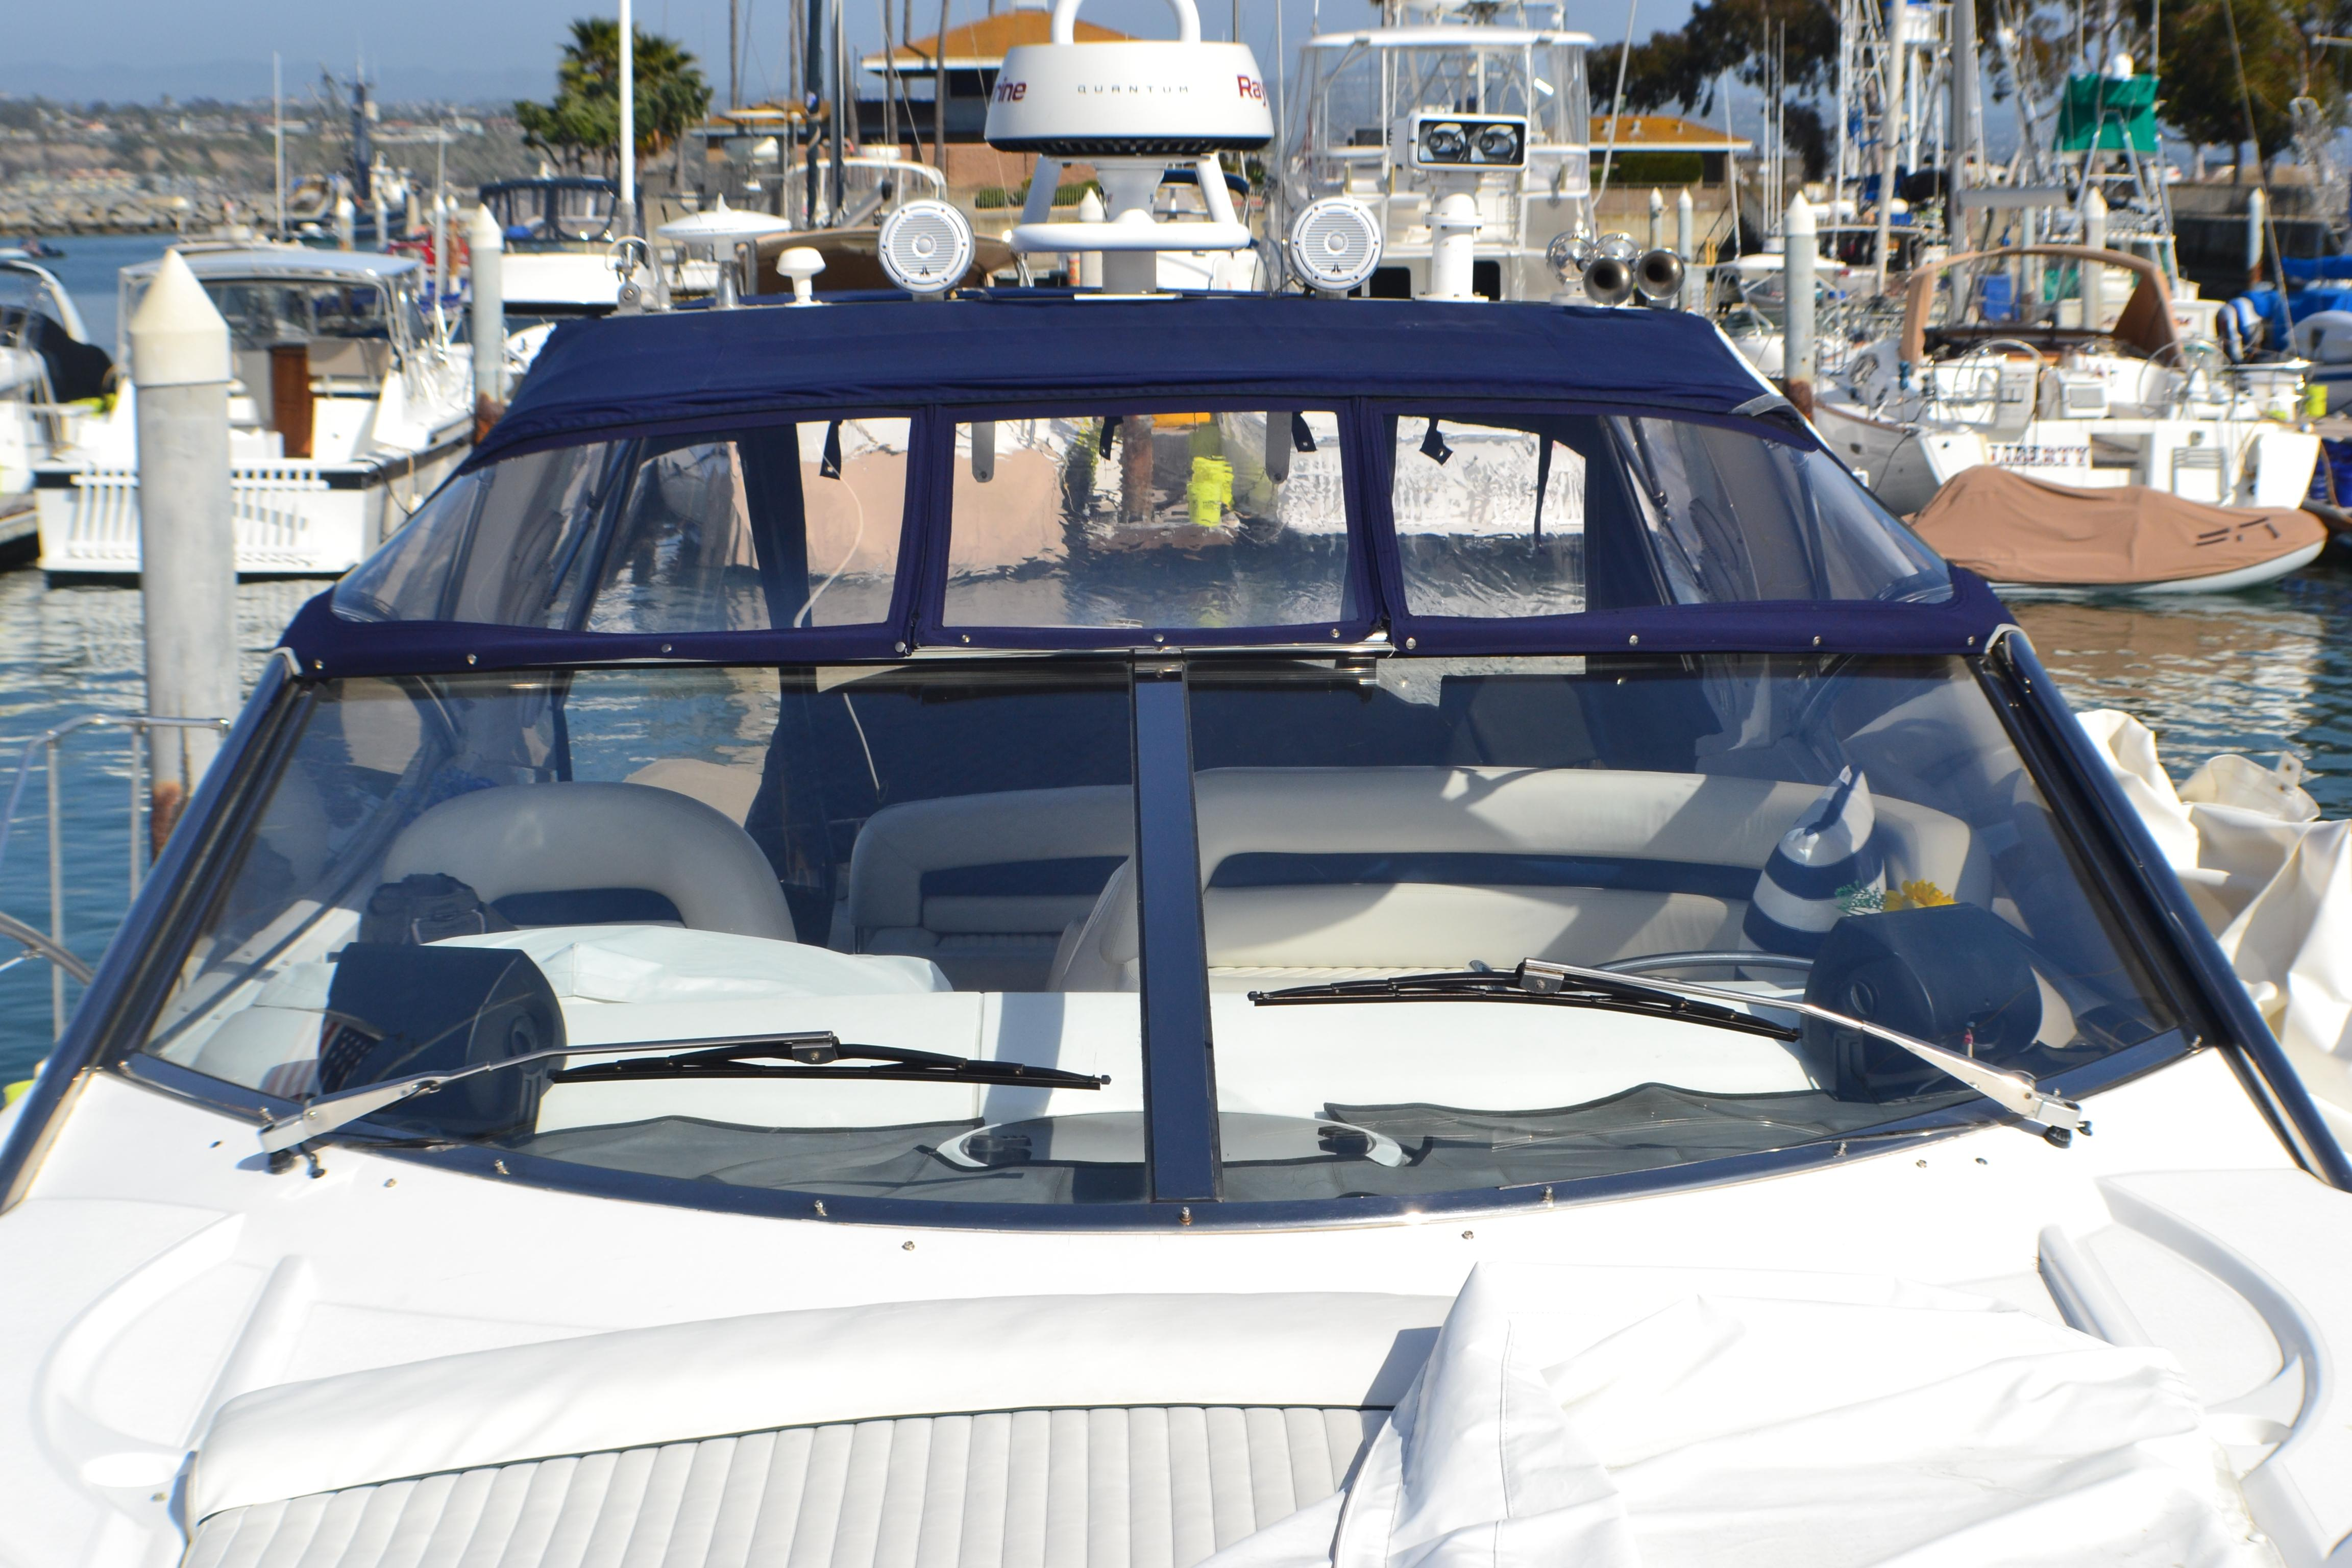 2005 Sunseeker Portofino 46 #TB0293DH inventory image at Sun Country Coastal in Dana Point